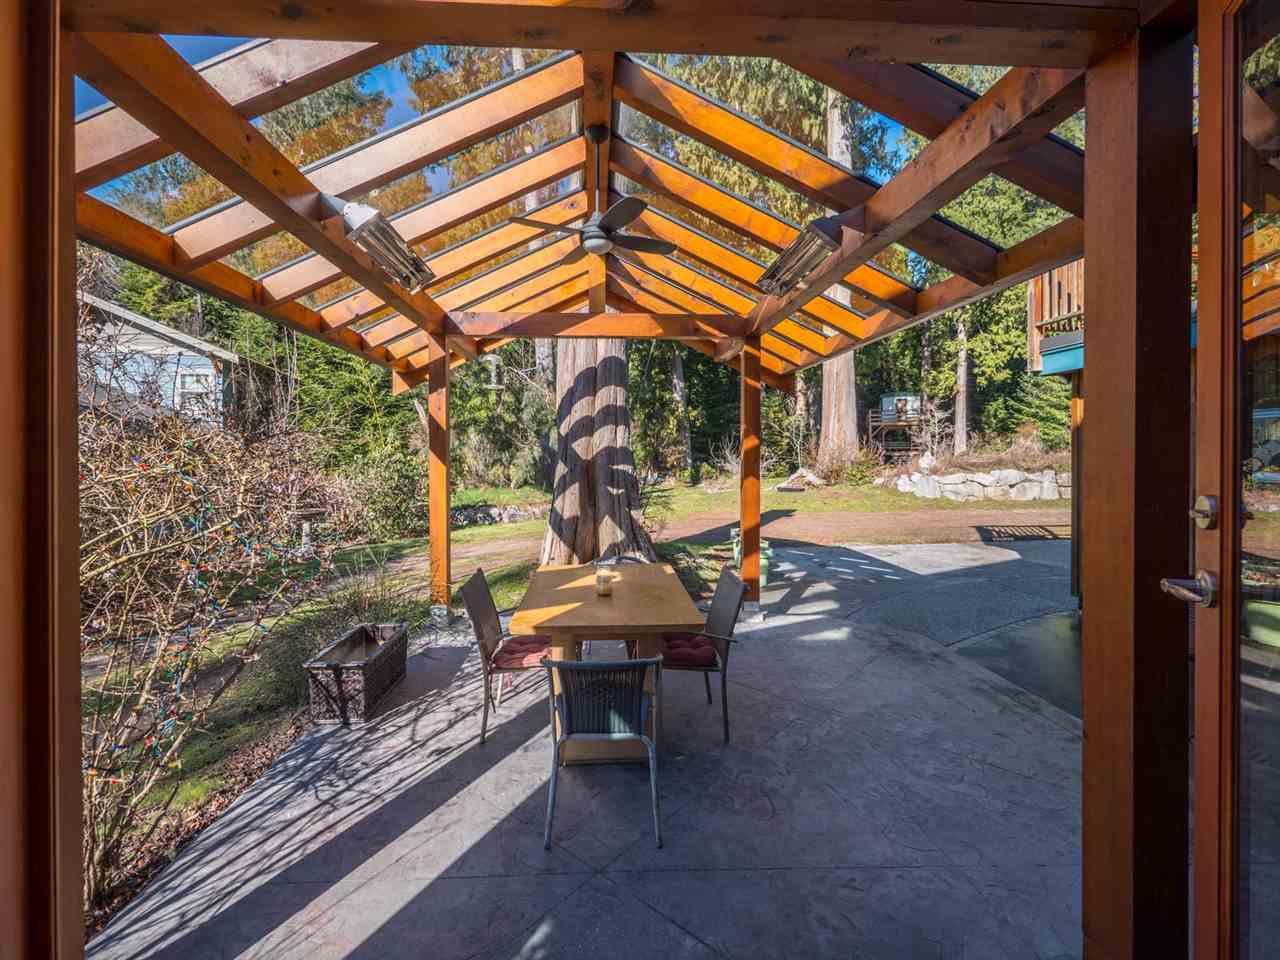 Photo 7: Photos: 3592 BEACH Avenue: Roberts Creek House for sale (Sunshine Coast)  : MLS®# R2244747